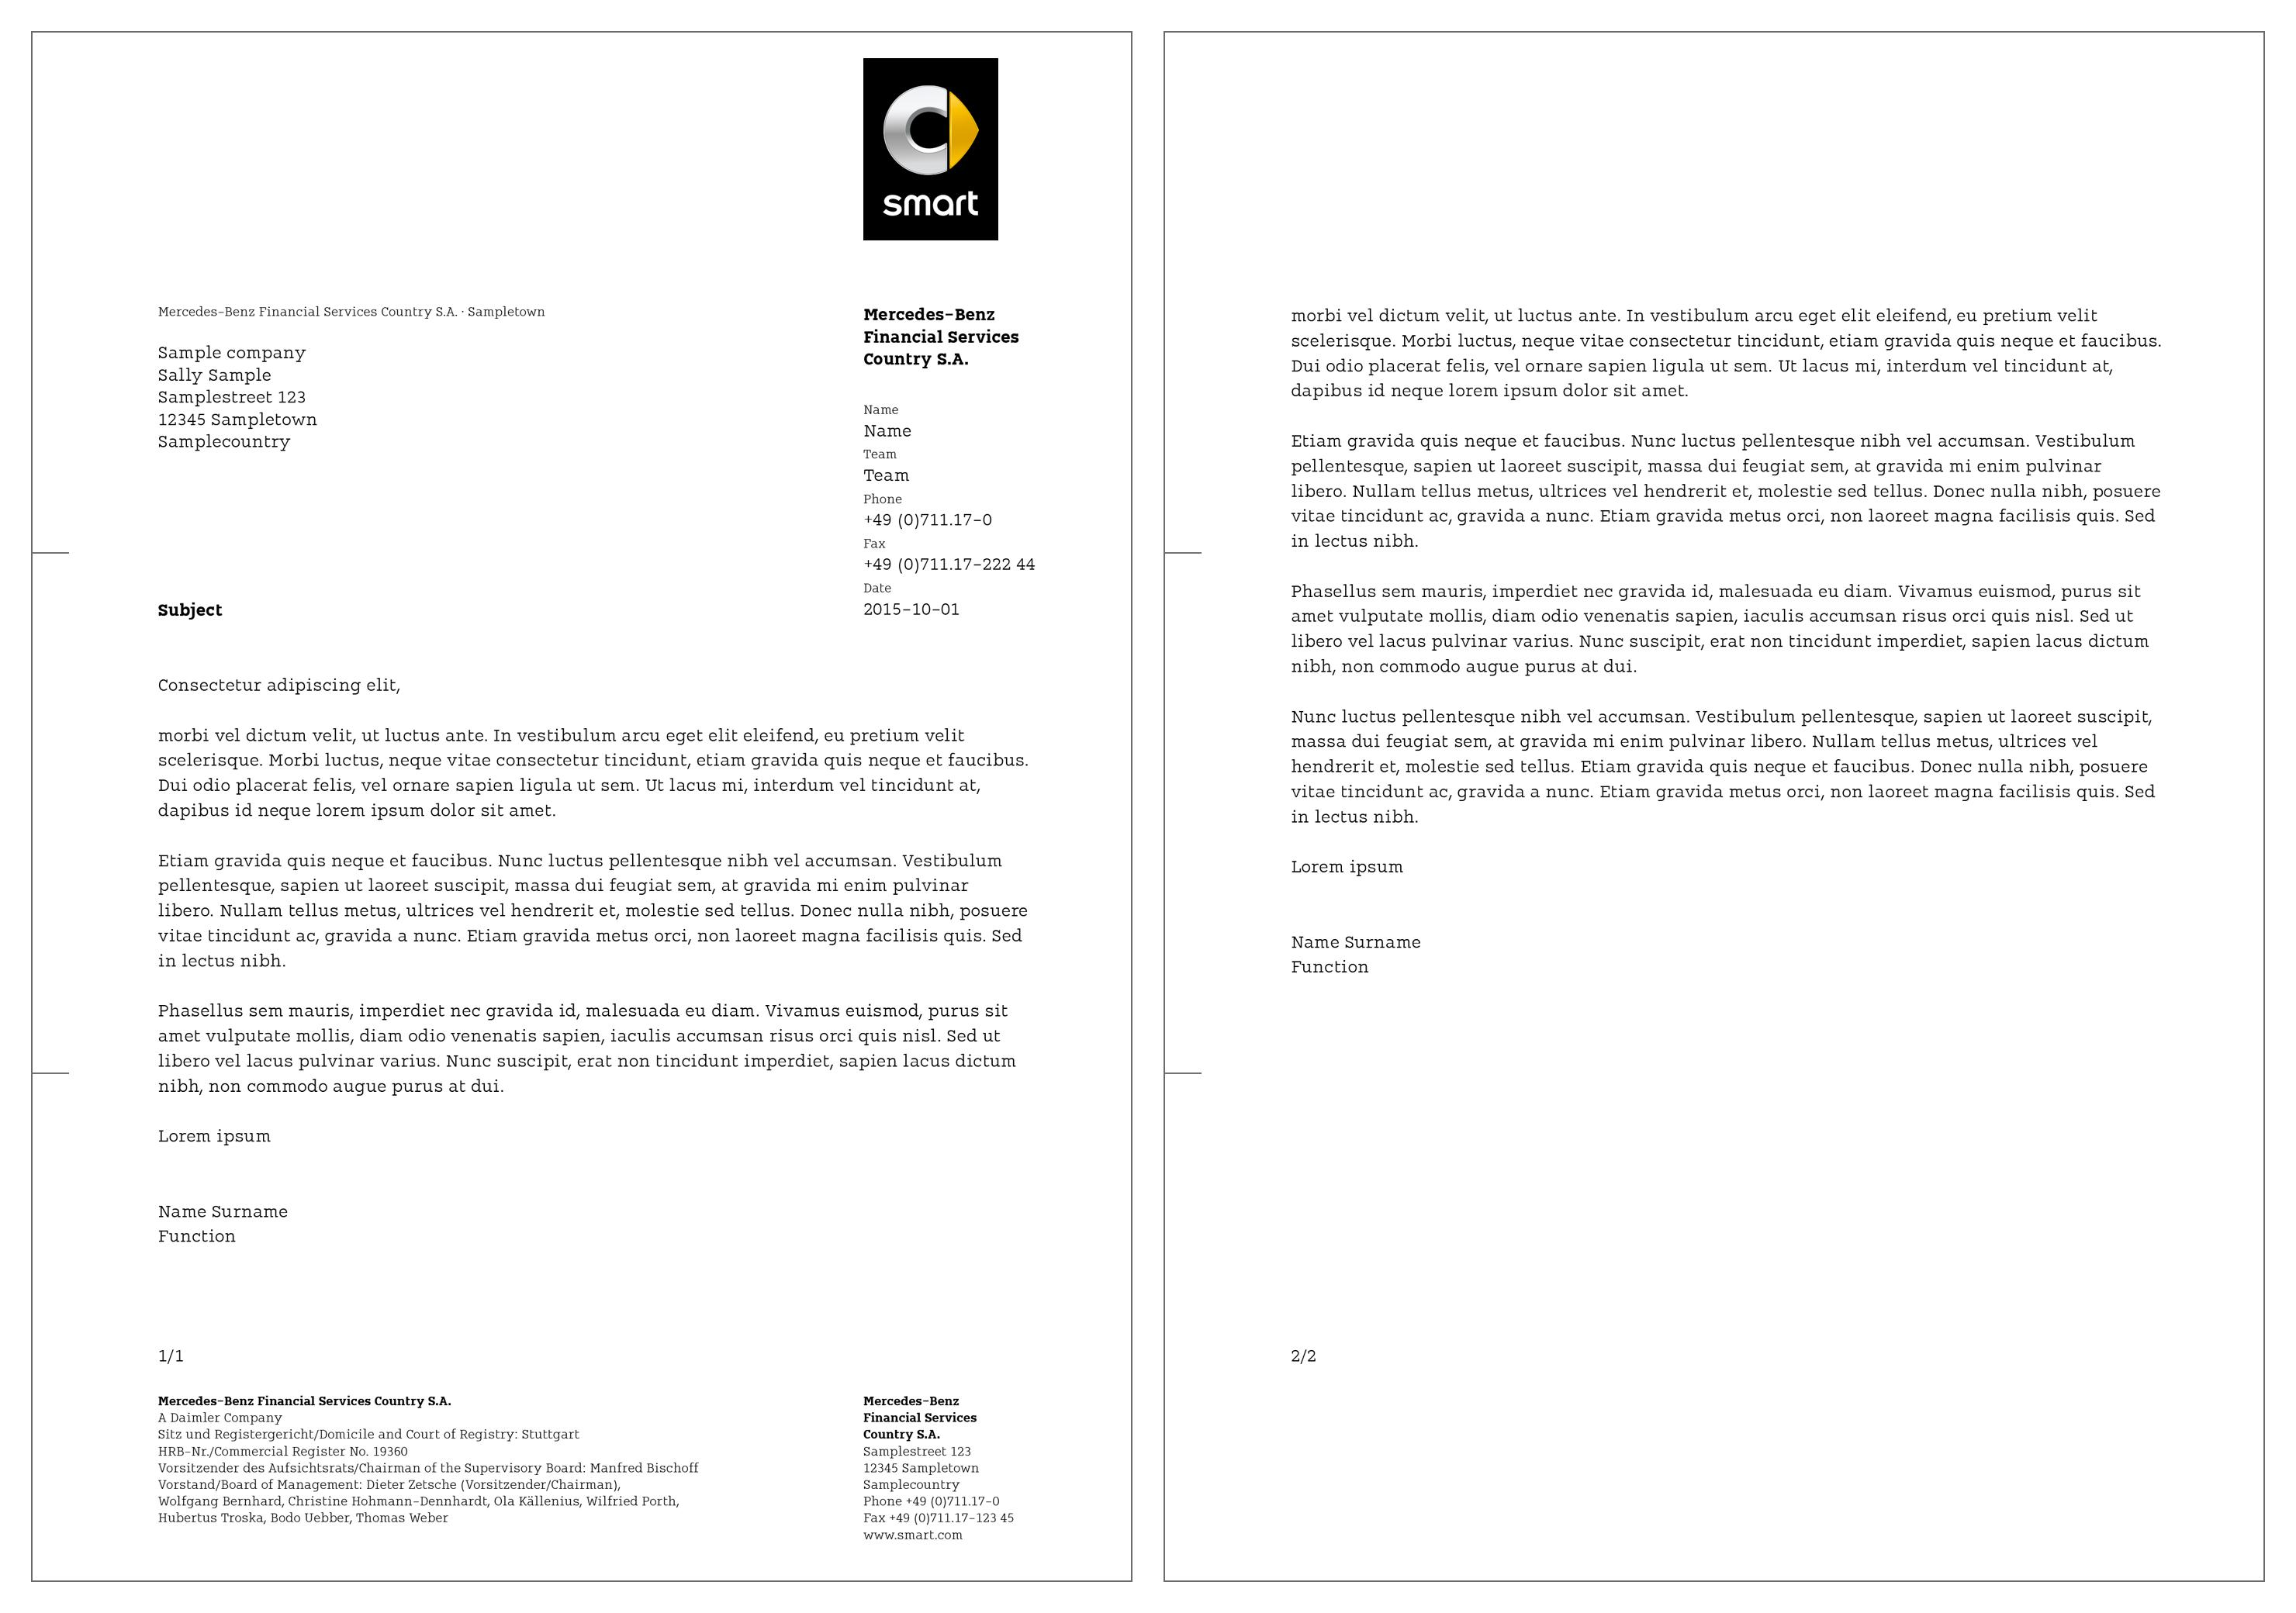 Financial services letterhead templates designs 28 for Uber letterhead